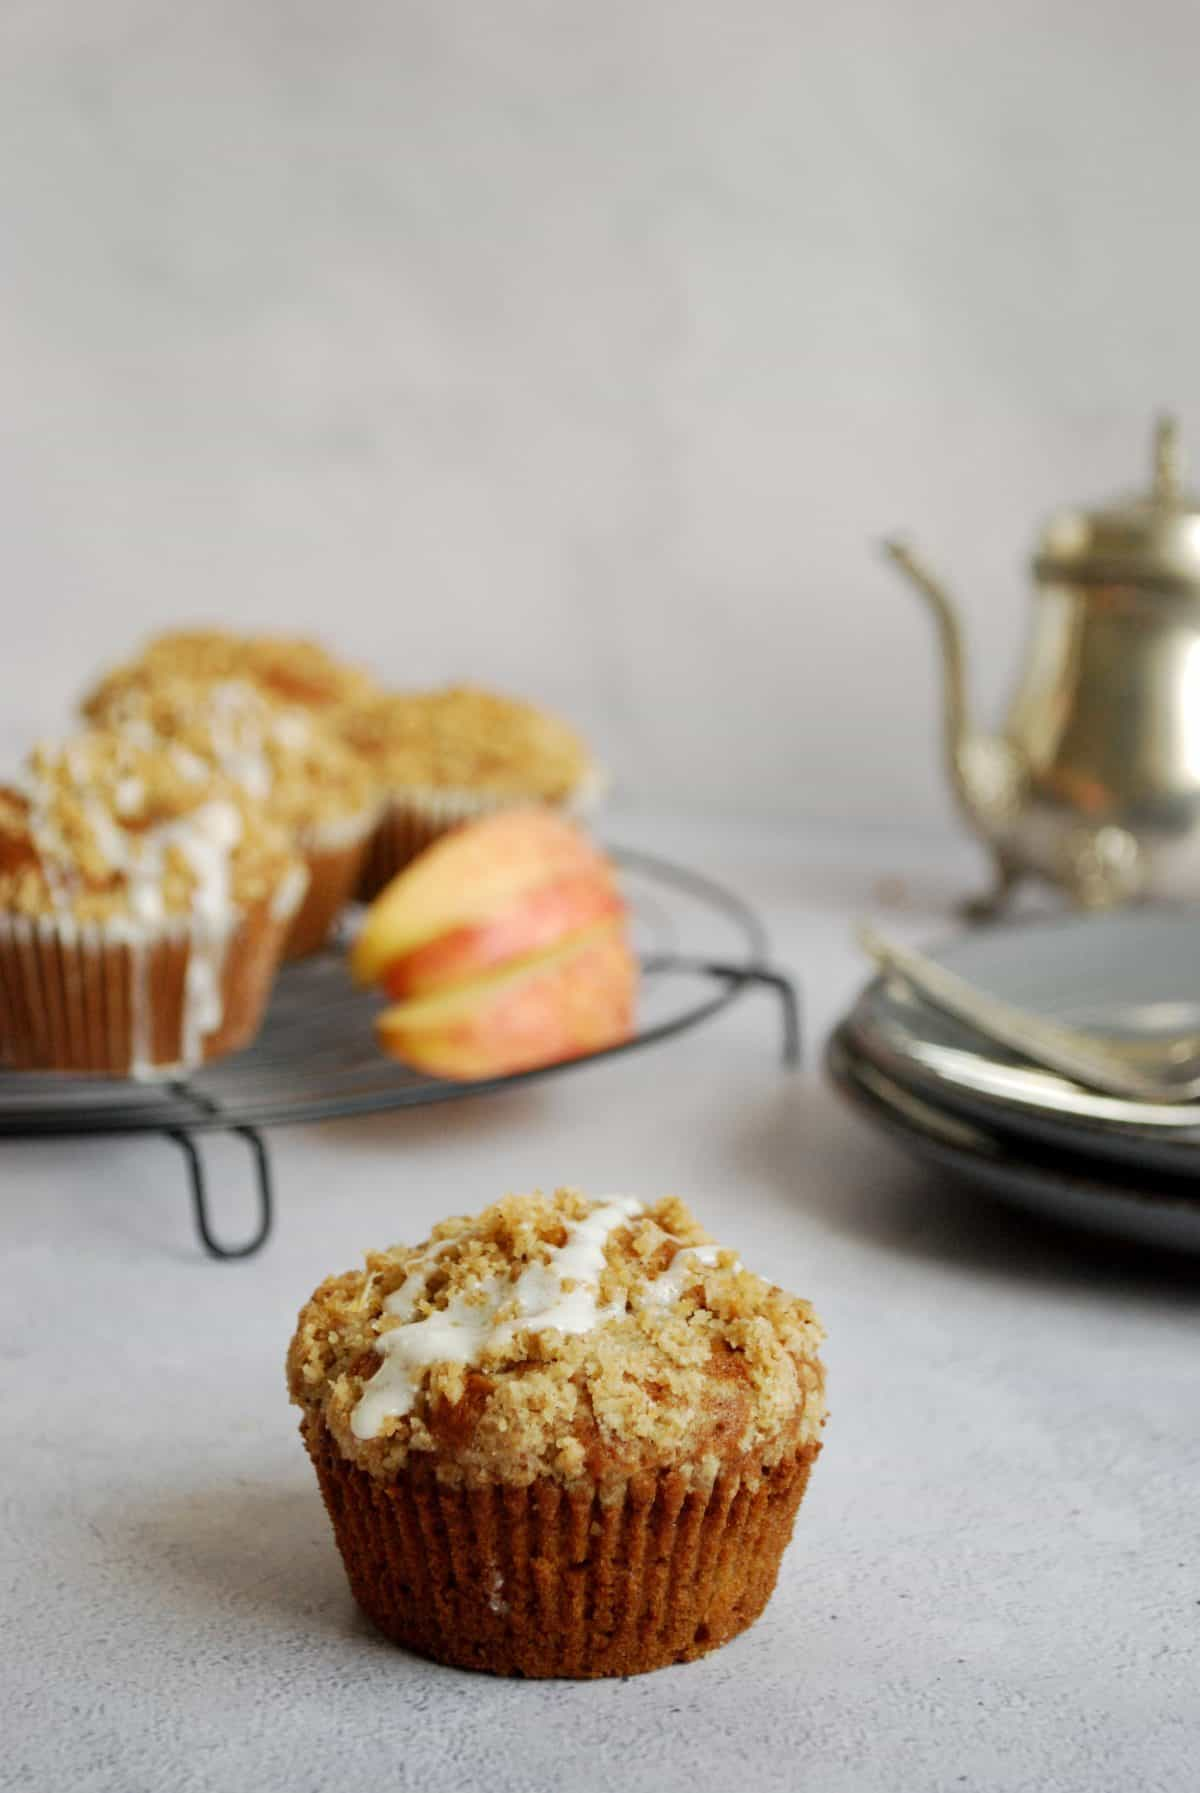 apple muffins, μάφινς με μήλο και κανέλα